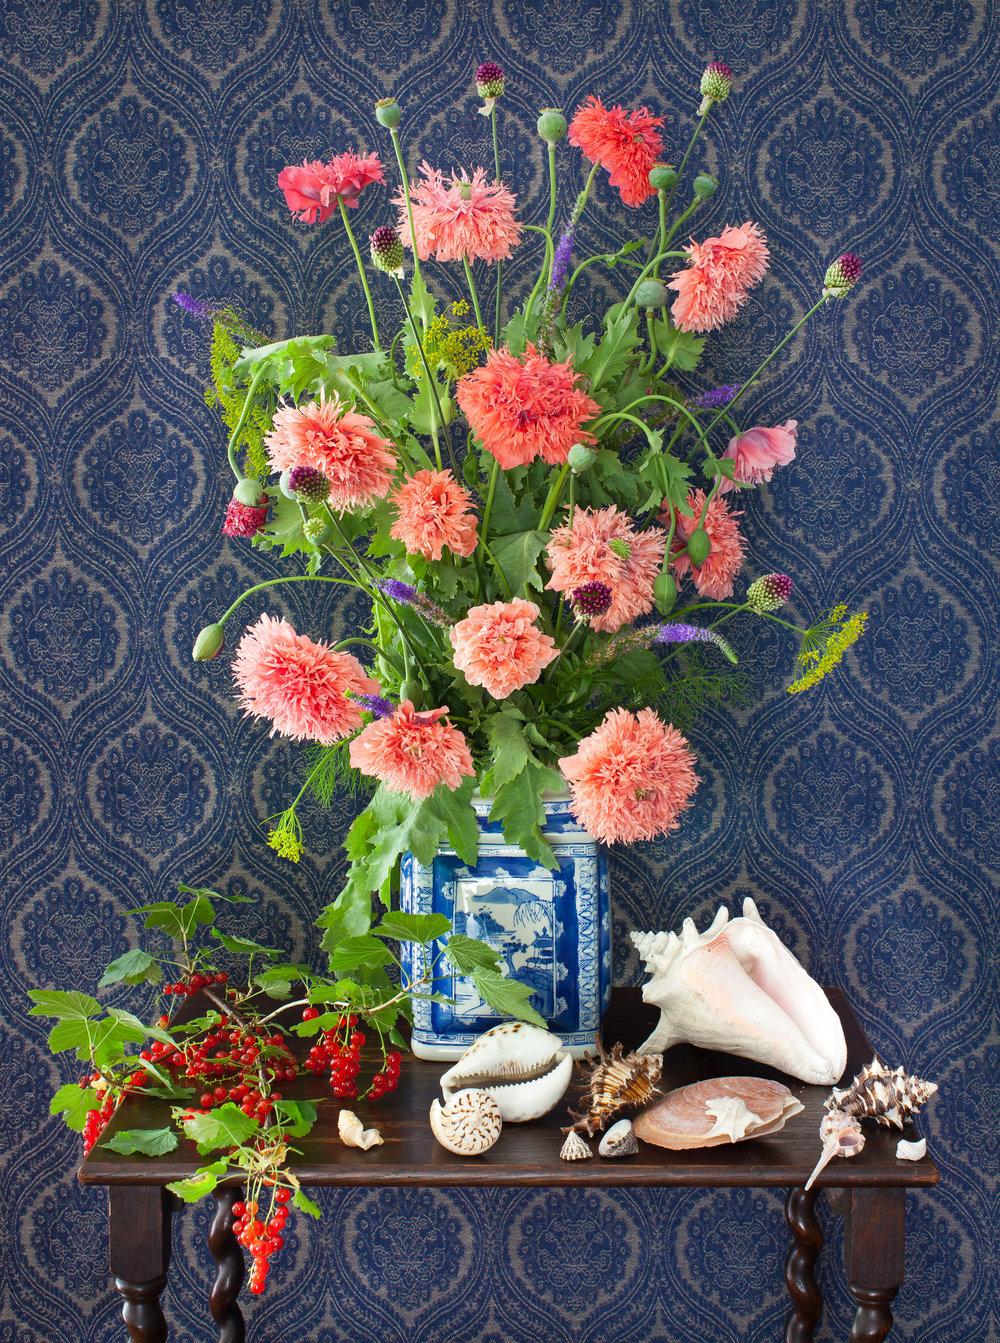 Pink Poppy Flowers & Shells 2017